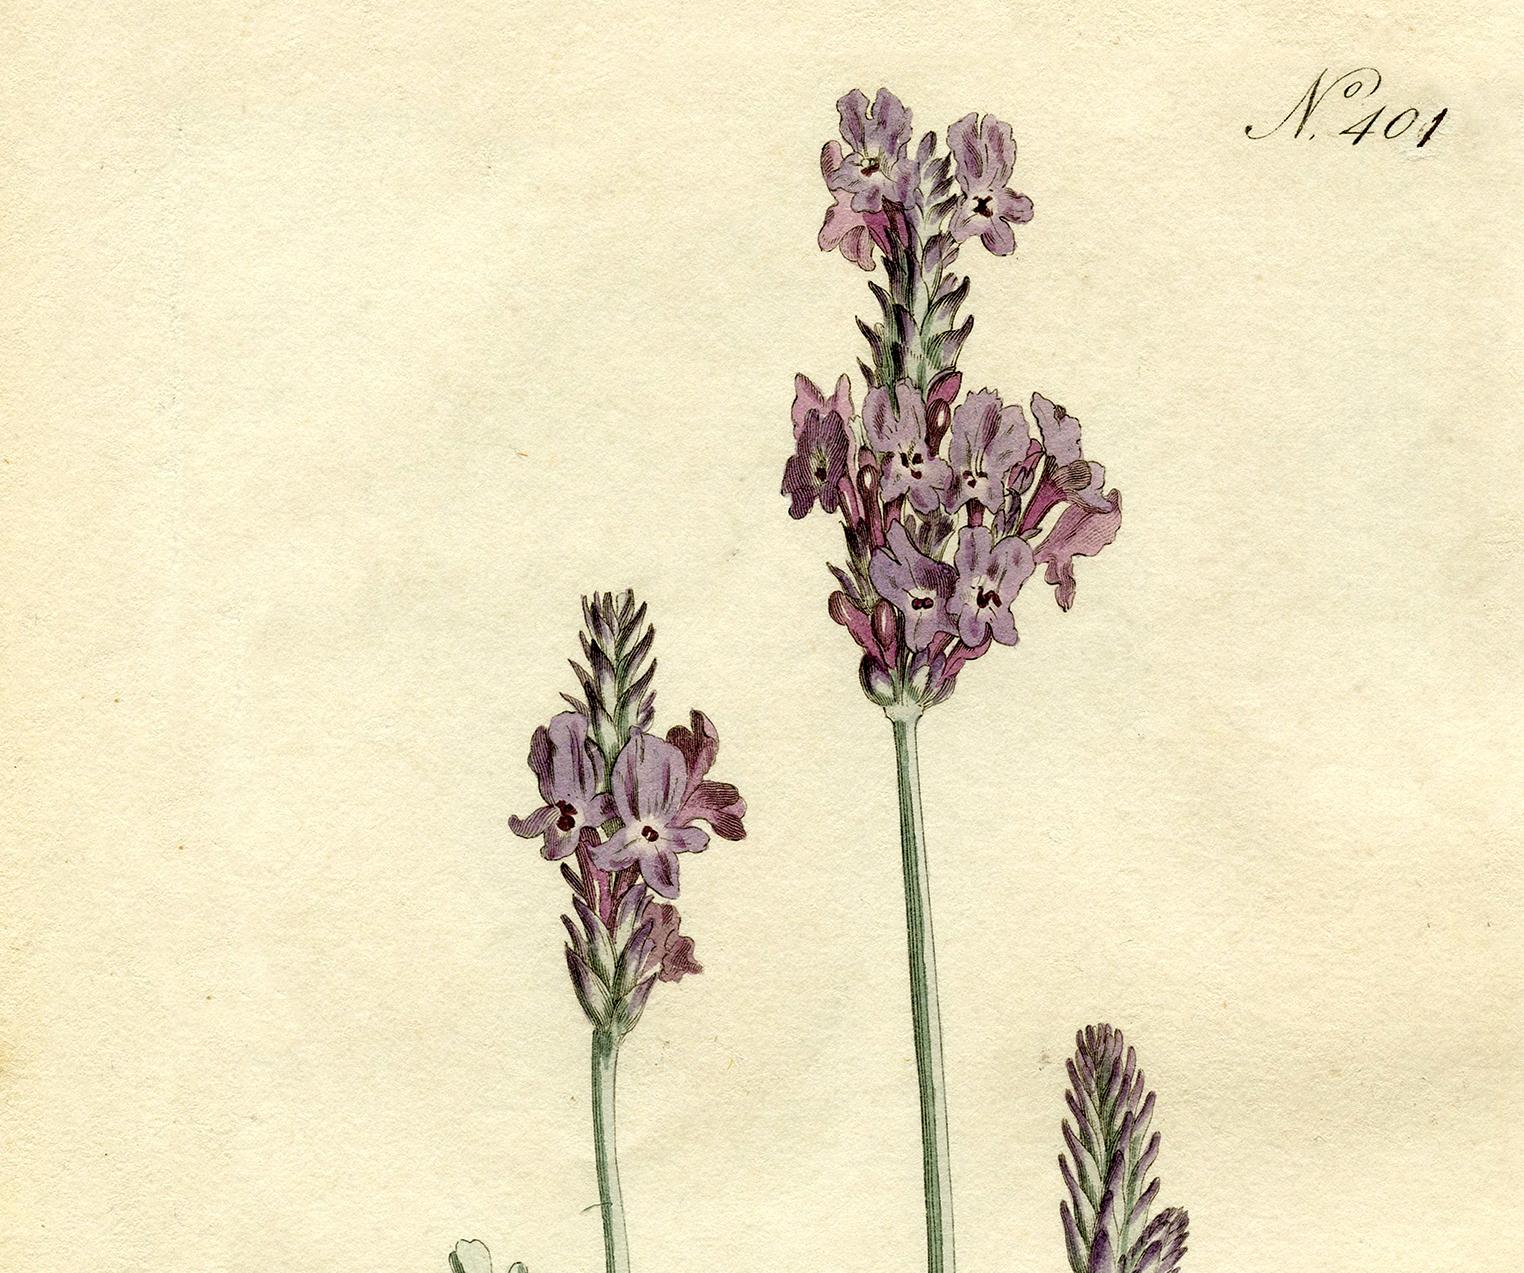 Free Lavender Botanical Print - The Graphics Fairy